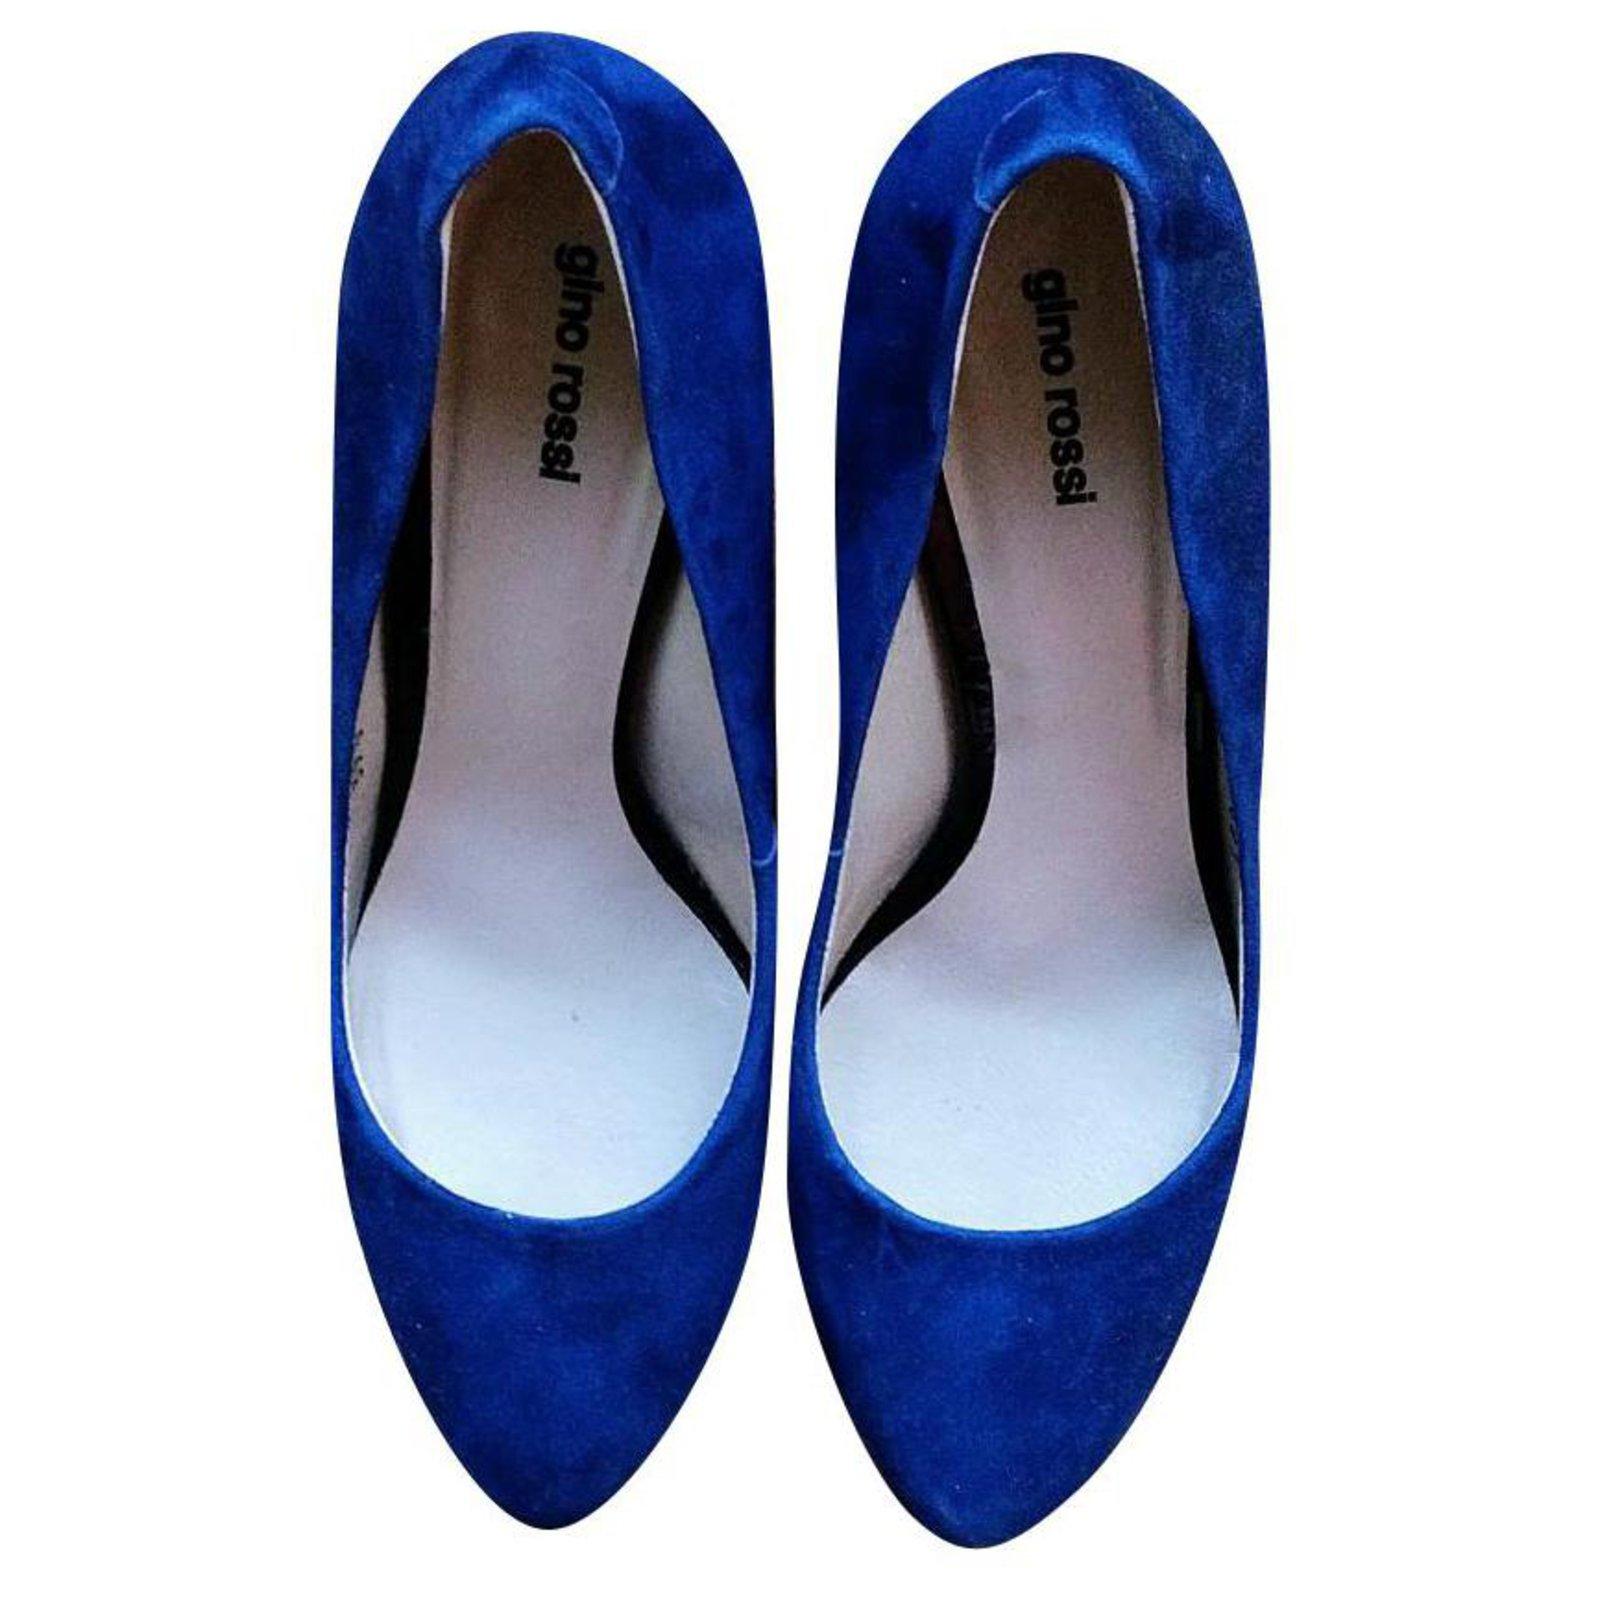 Gino Rossi Royal blue pumps Heels